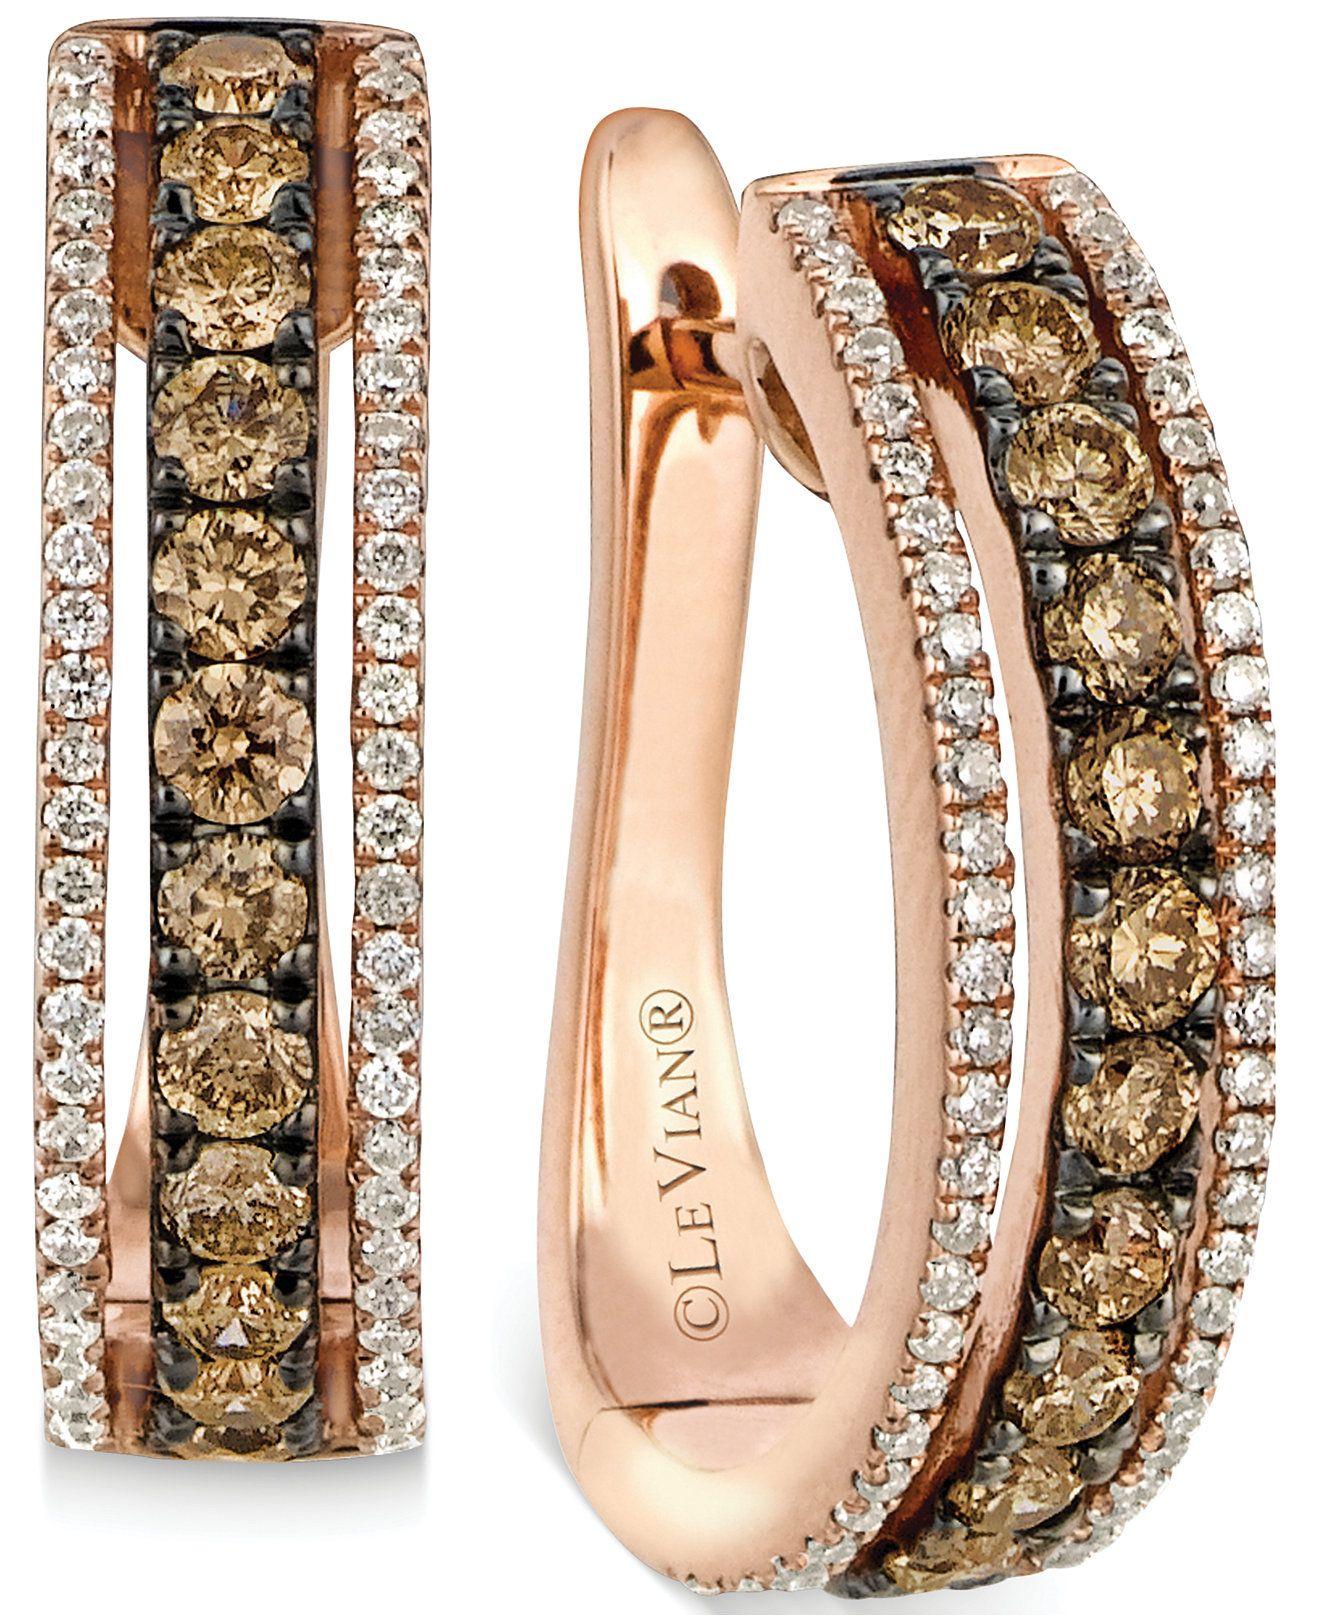 Le Vian Chocolate and White Diamond Hoop Earrings in 14k Rose Gold